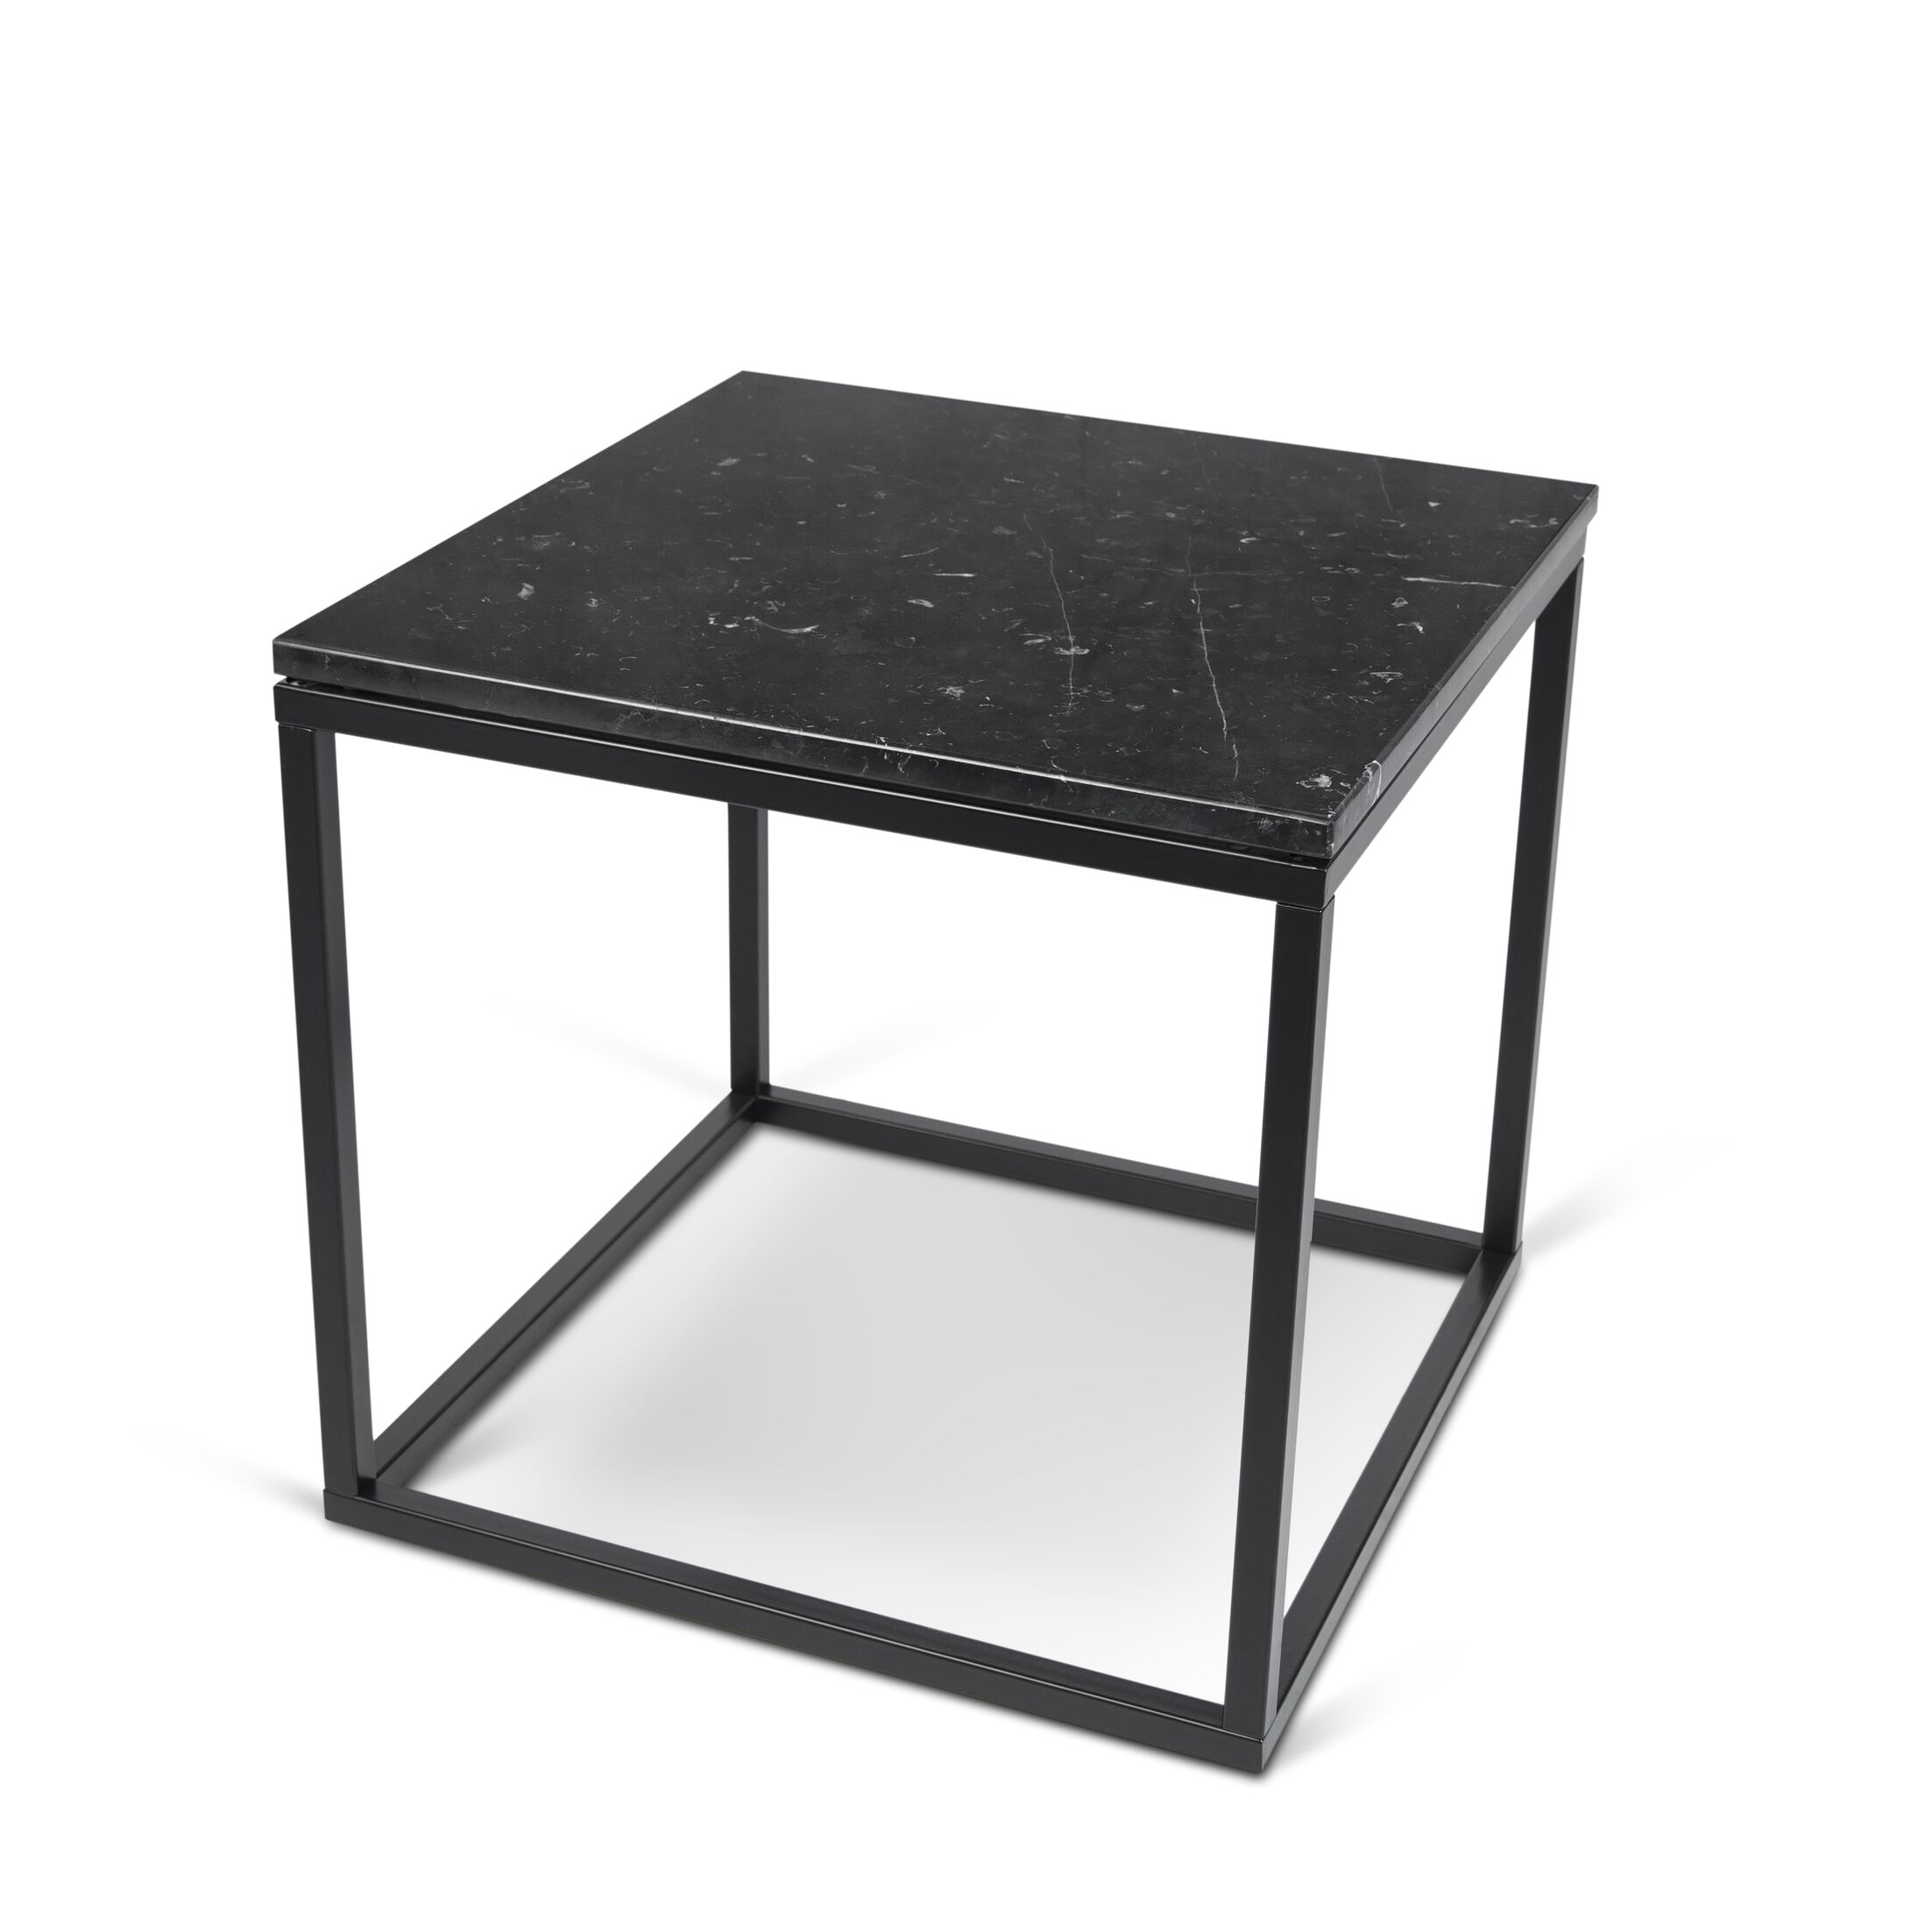 Prairie End Table Table Base Color: Chrome, Table Top Color: Black